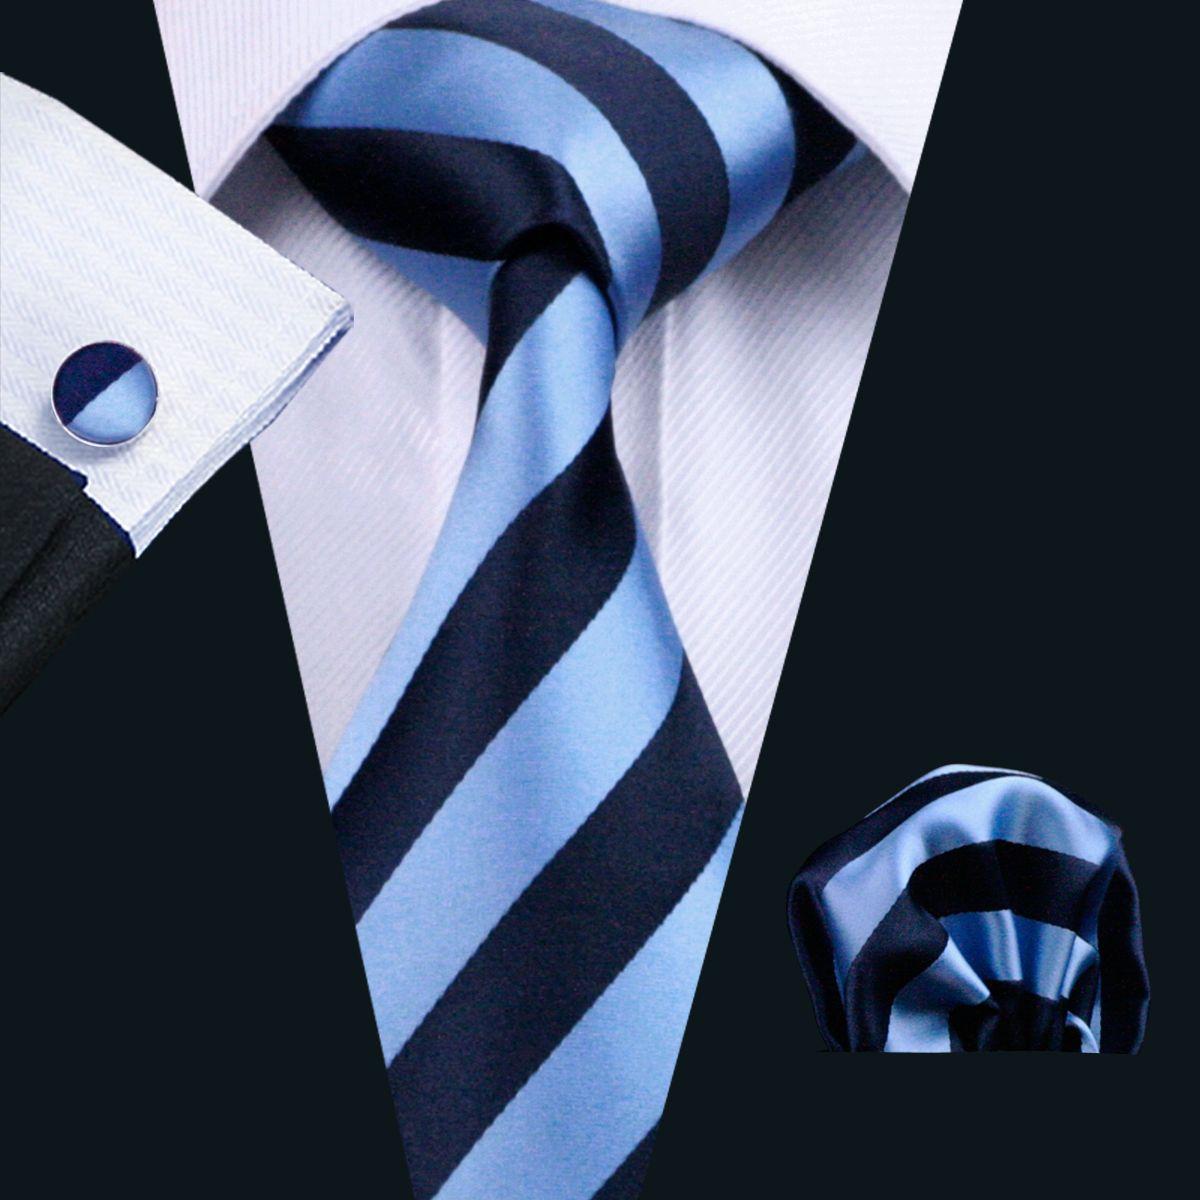 Business Tie Set Blue Stripe Hanky Cufflinks Silk Jacquard Ties For Men Tie Woven Classic Necktie N-0285